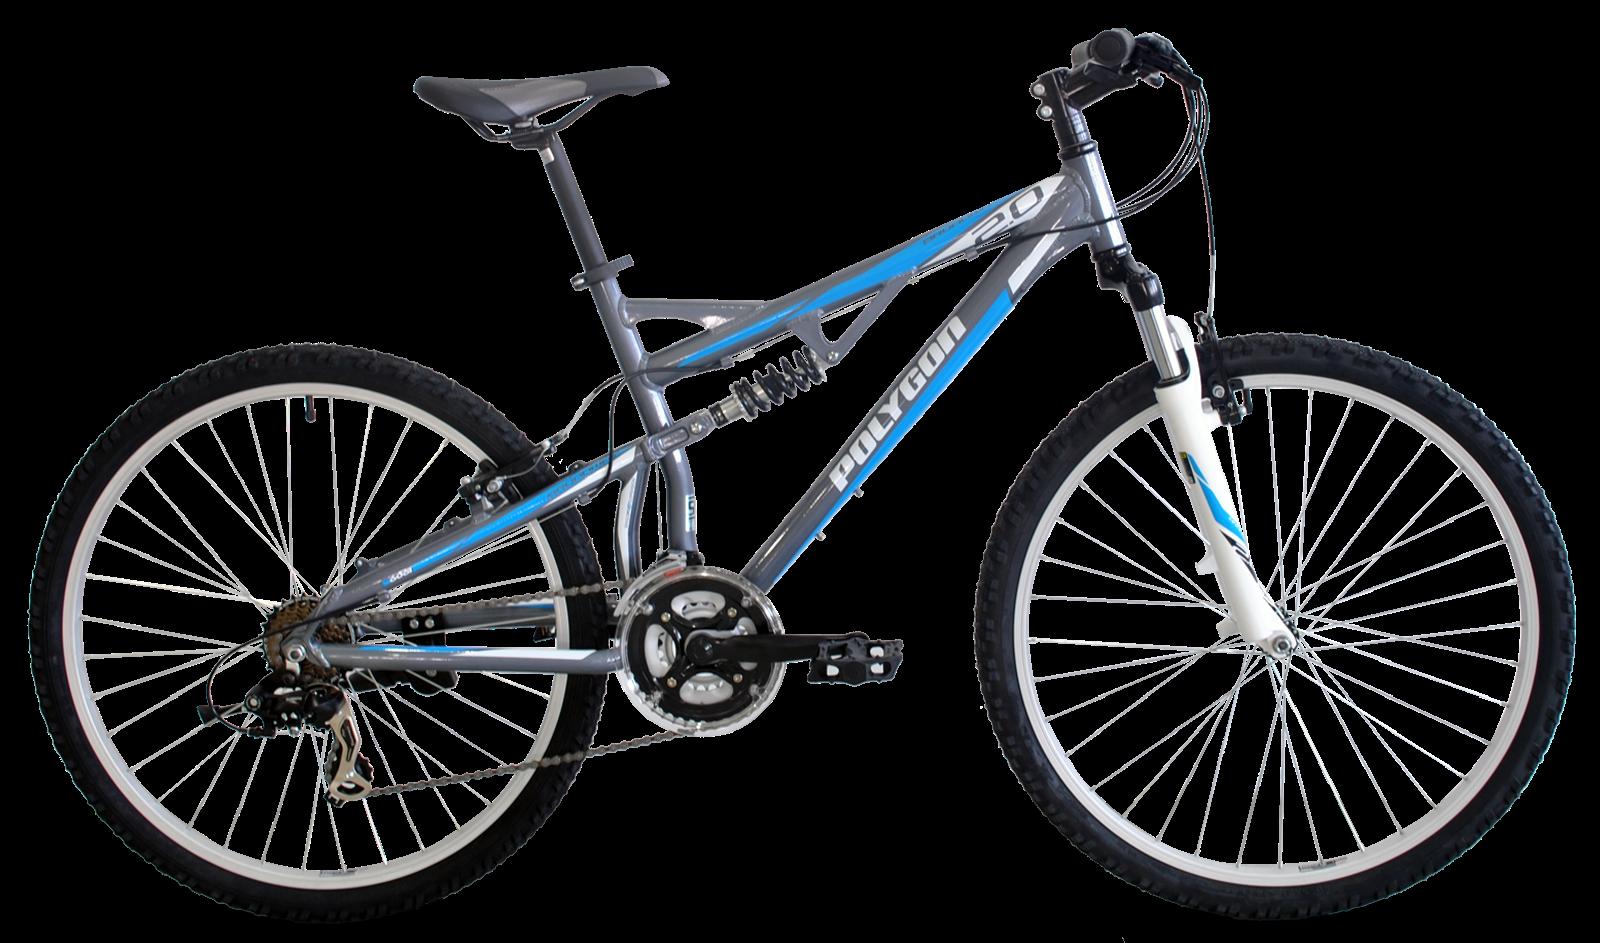 FIA BIKE Sepeda Gunung Polygon BROADWAY 2.0 (Series 2013)